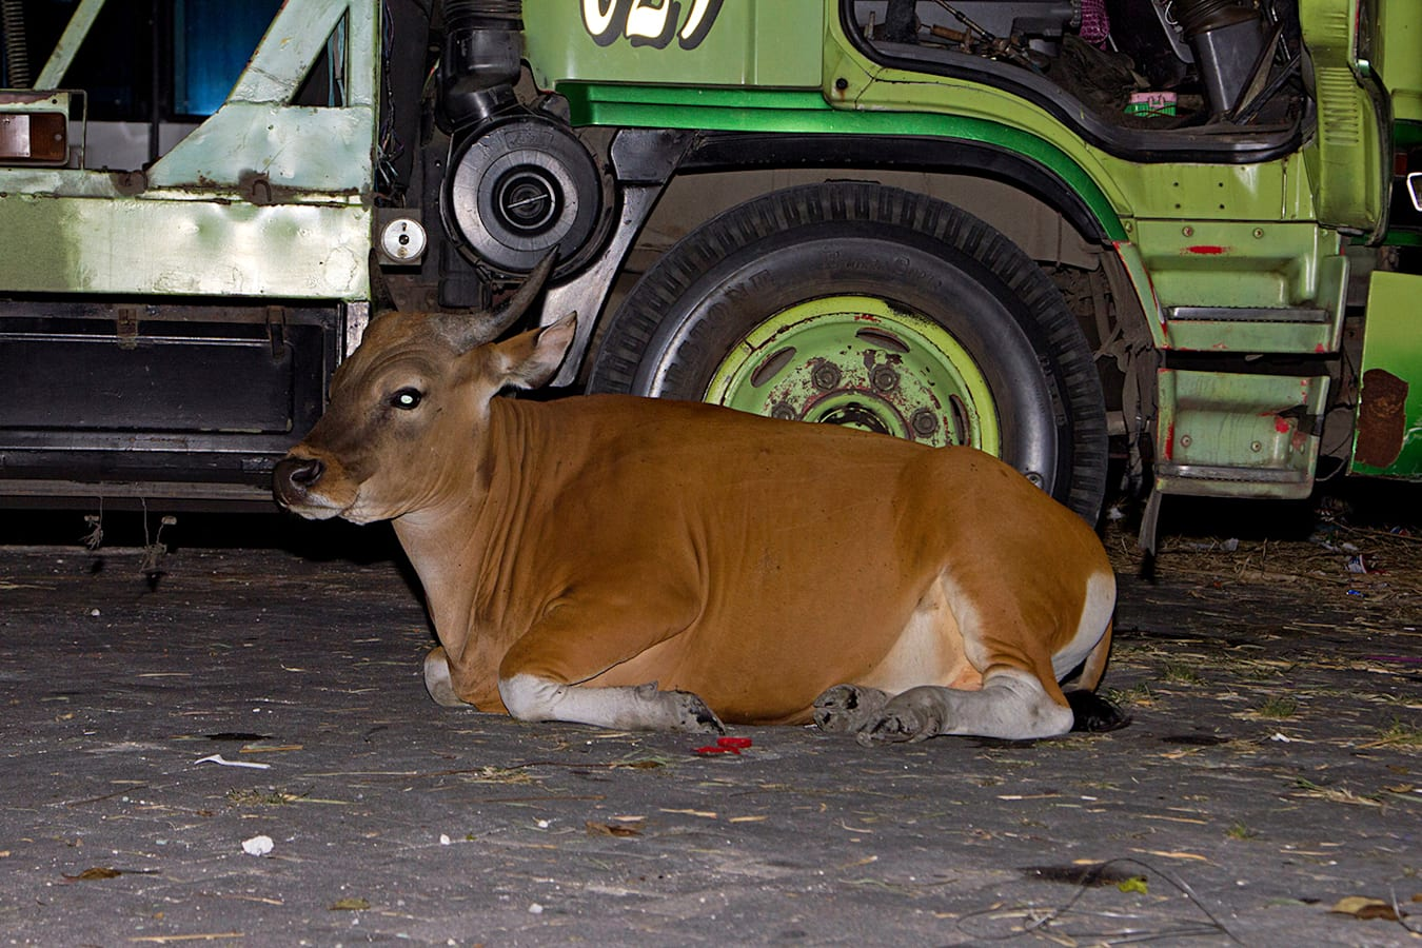 Cow in streets of Kuta